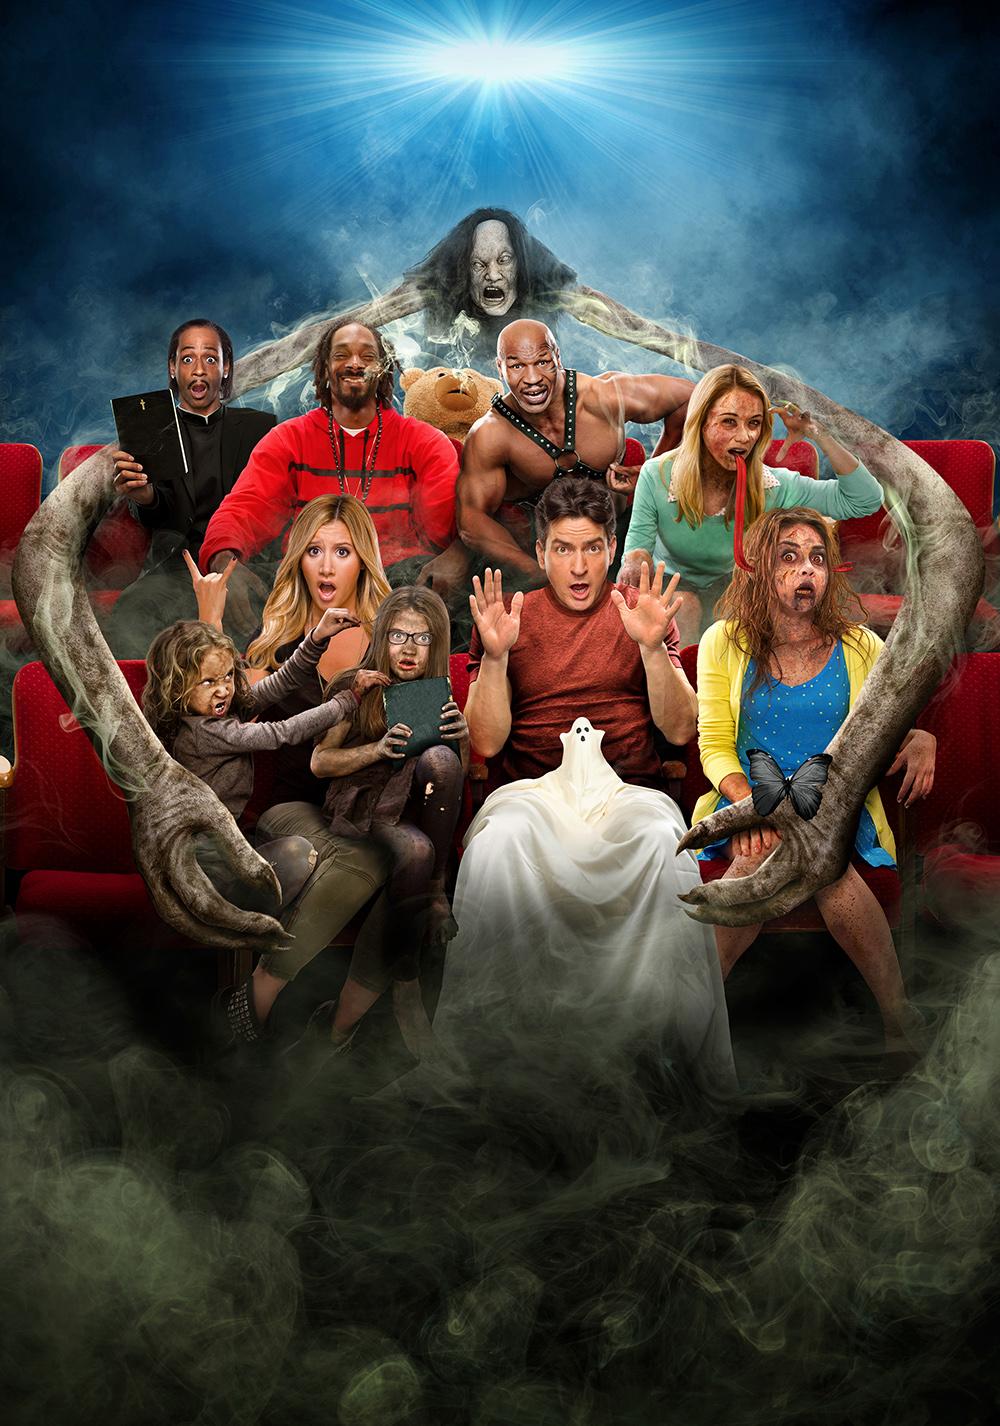 scary movie 5 movie fanart fanarttv